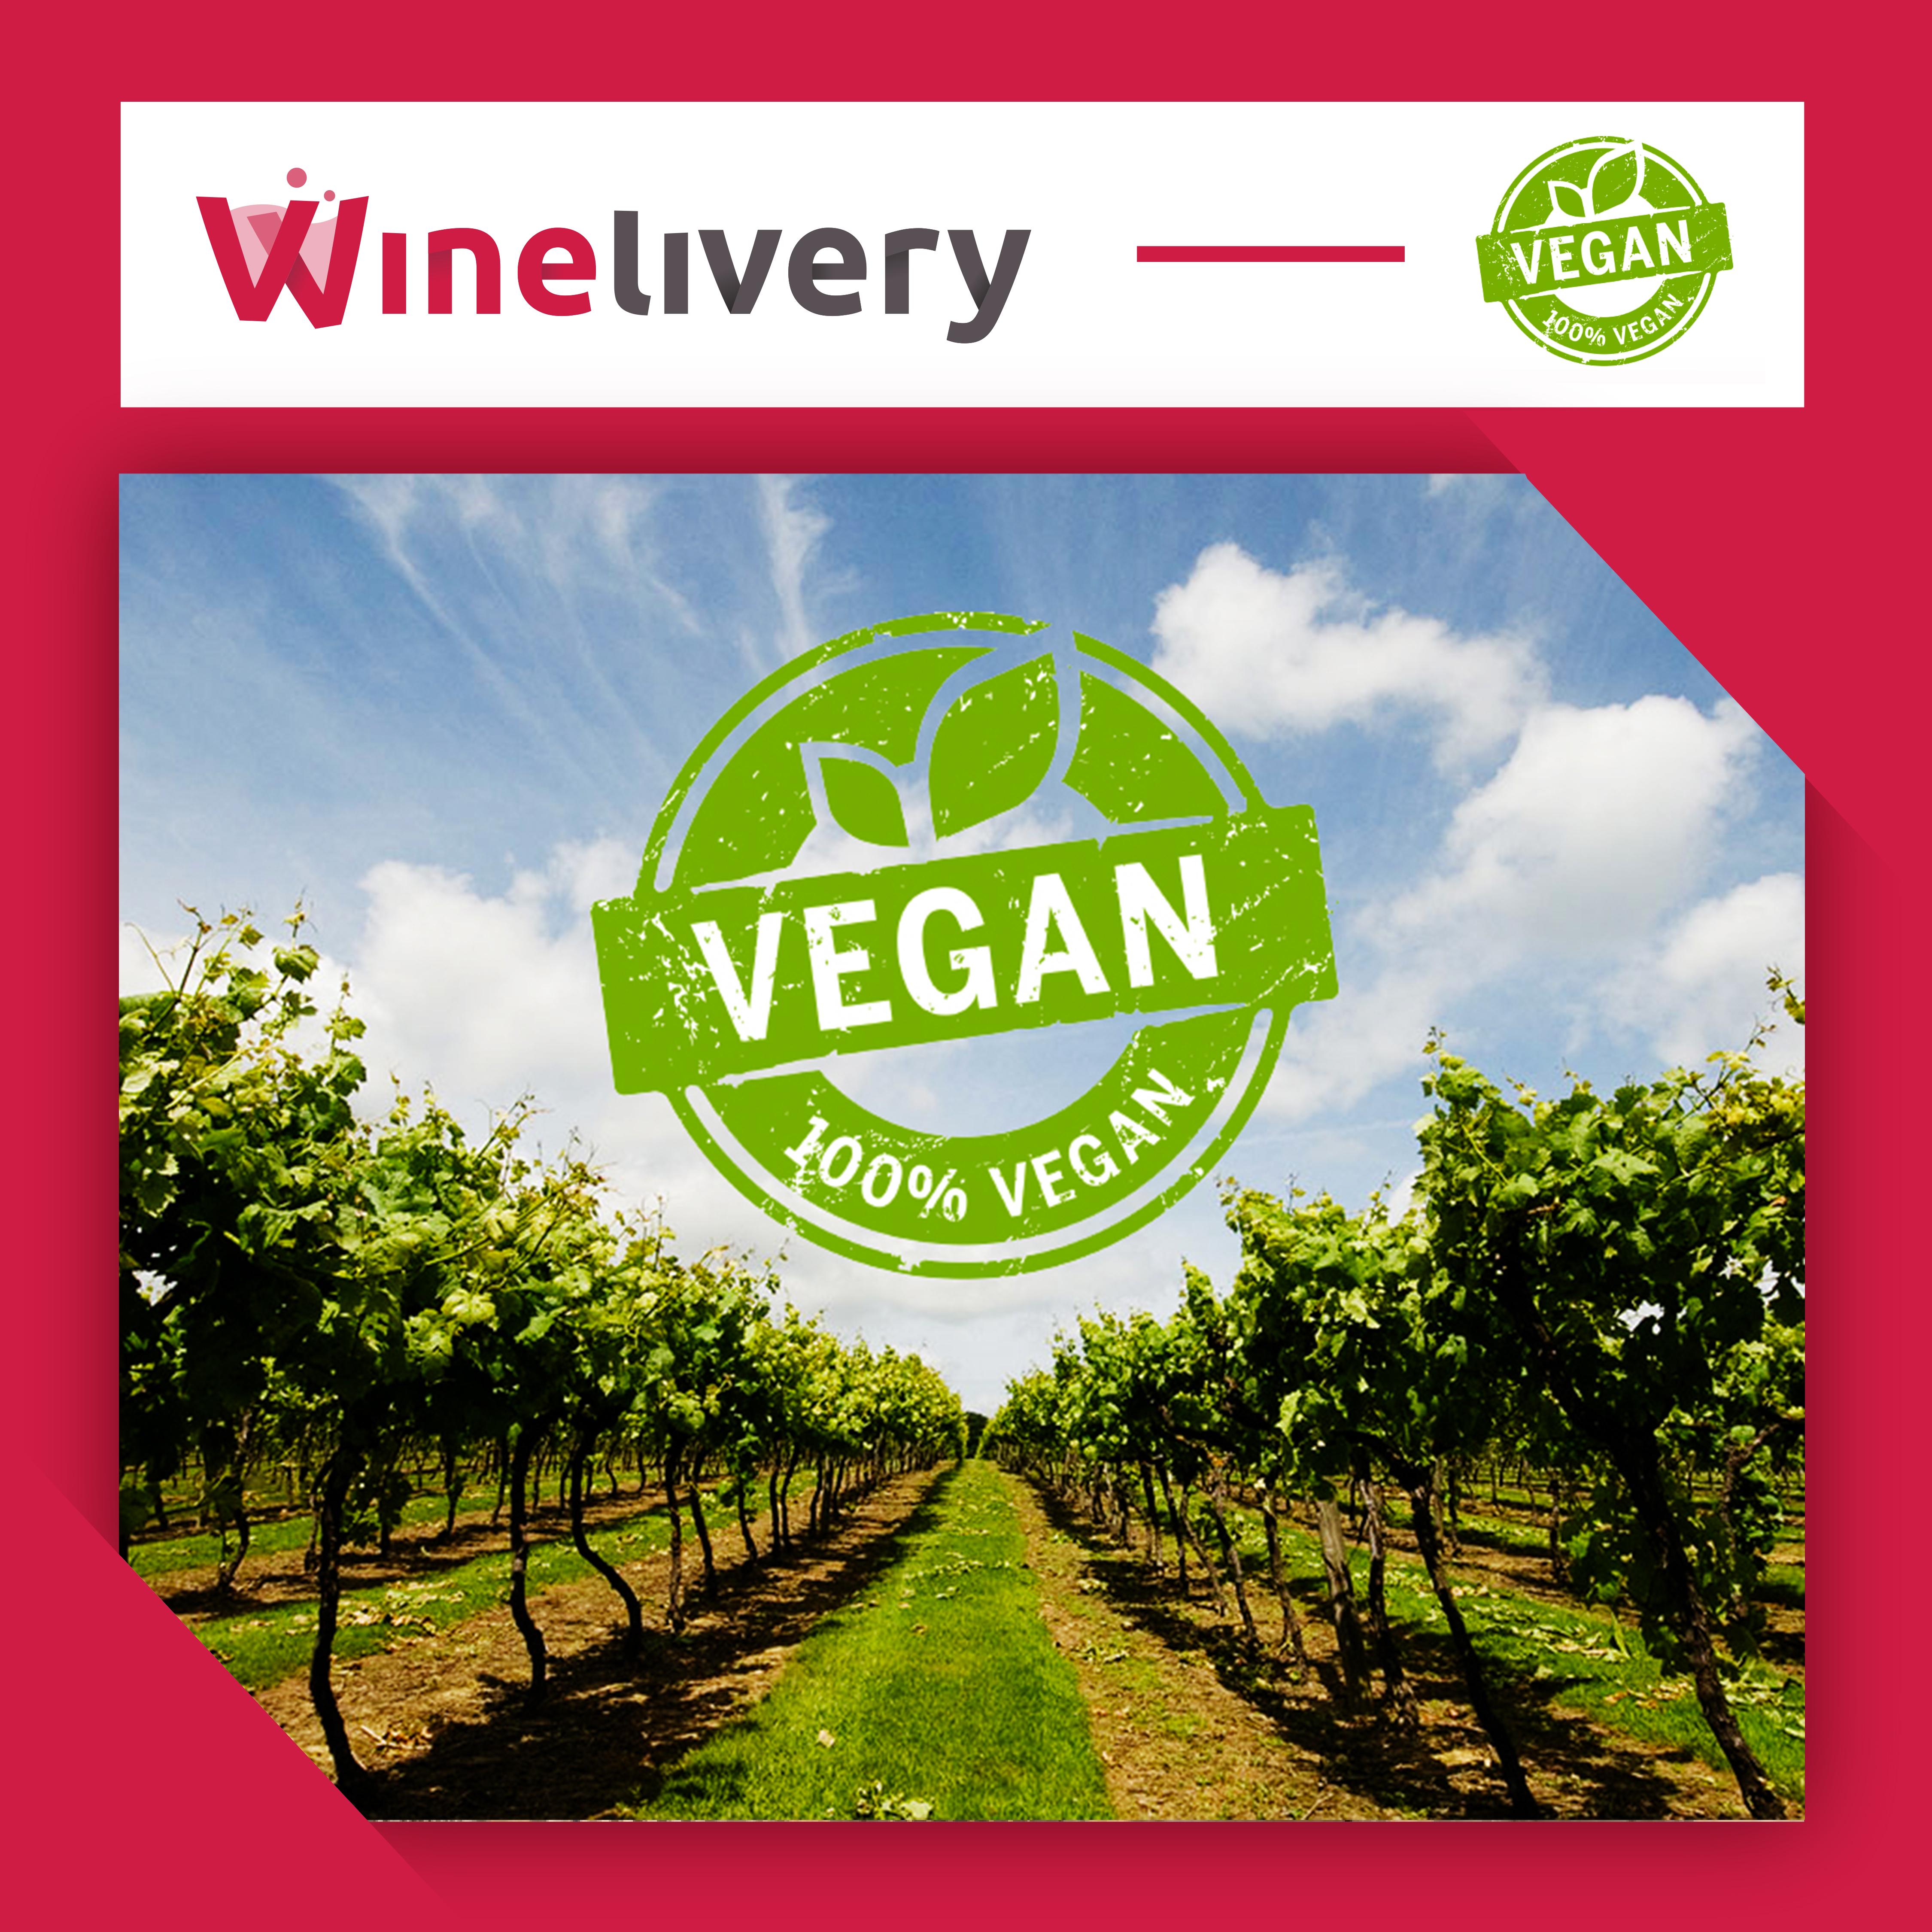 I 5 consigli di Winelivery sui vini vegani